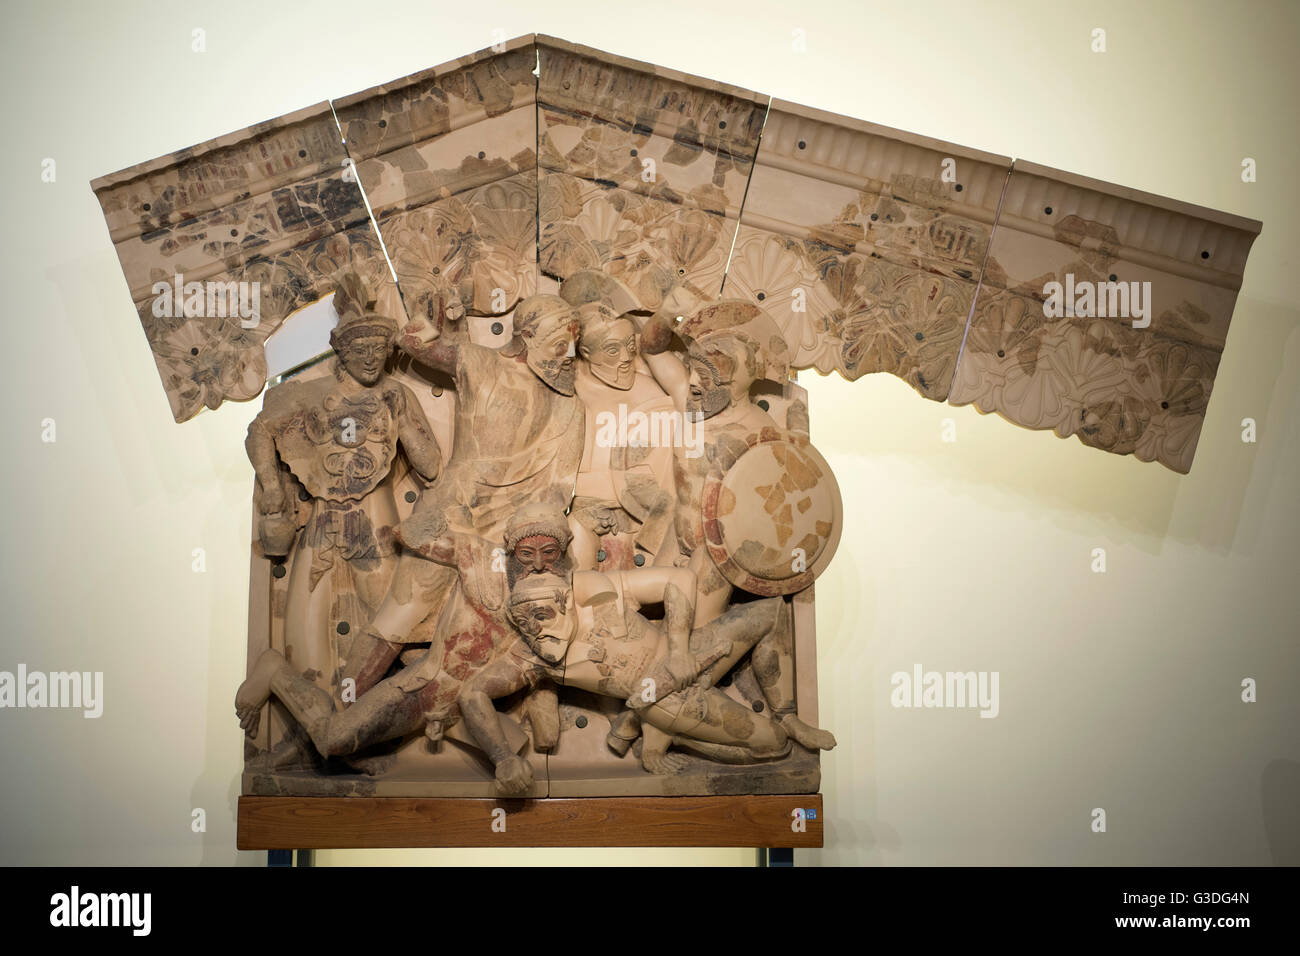 Italien, Rom, Museo Nazionale Etrusco di Villa Giulia, etruskischer Giebel - Stock Image